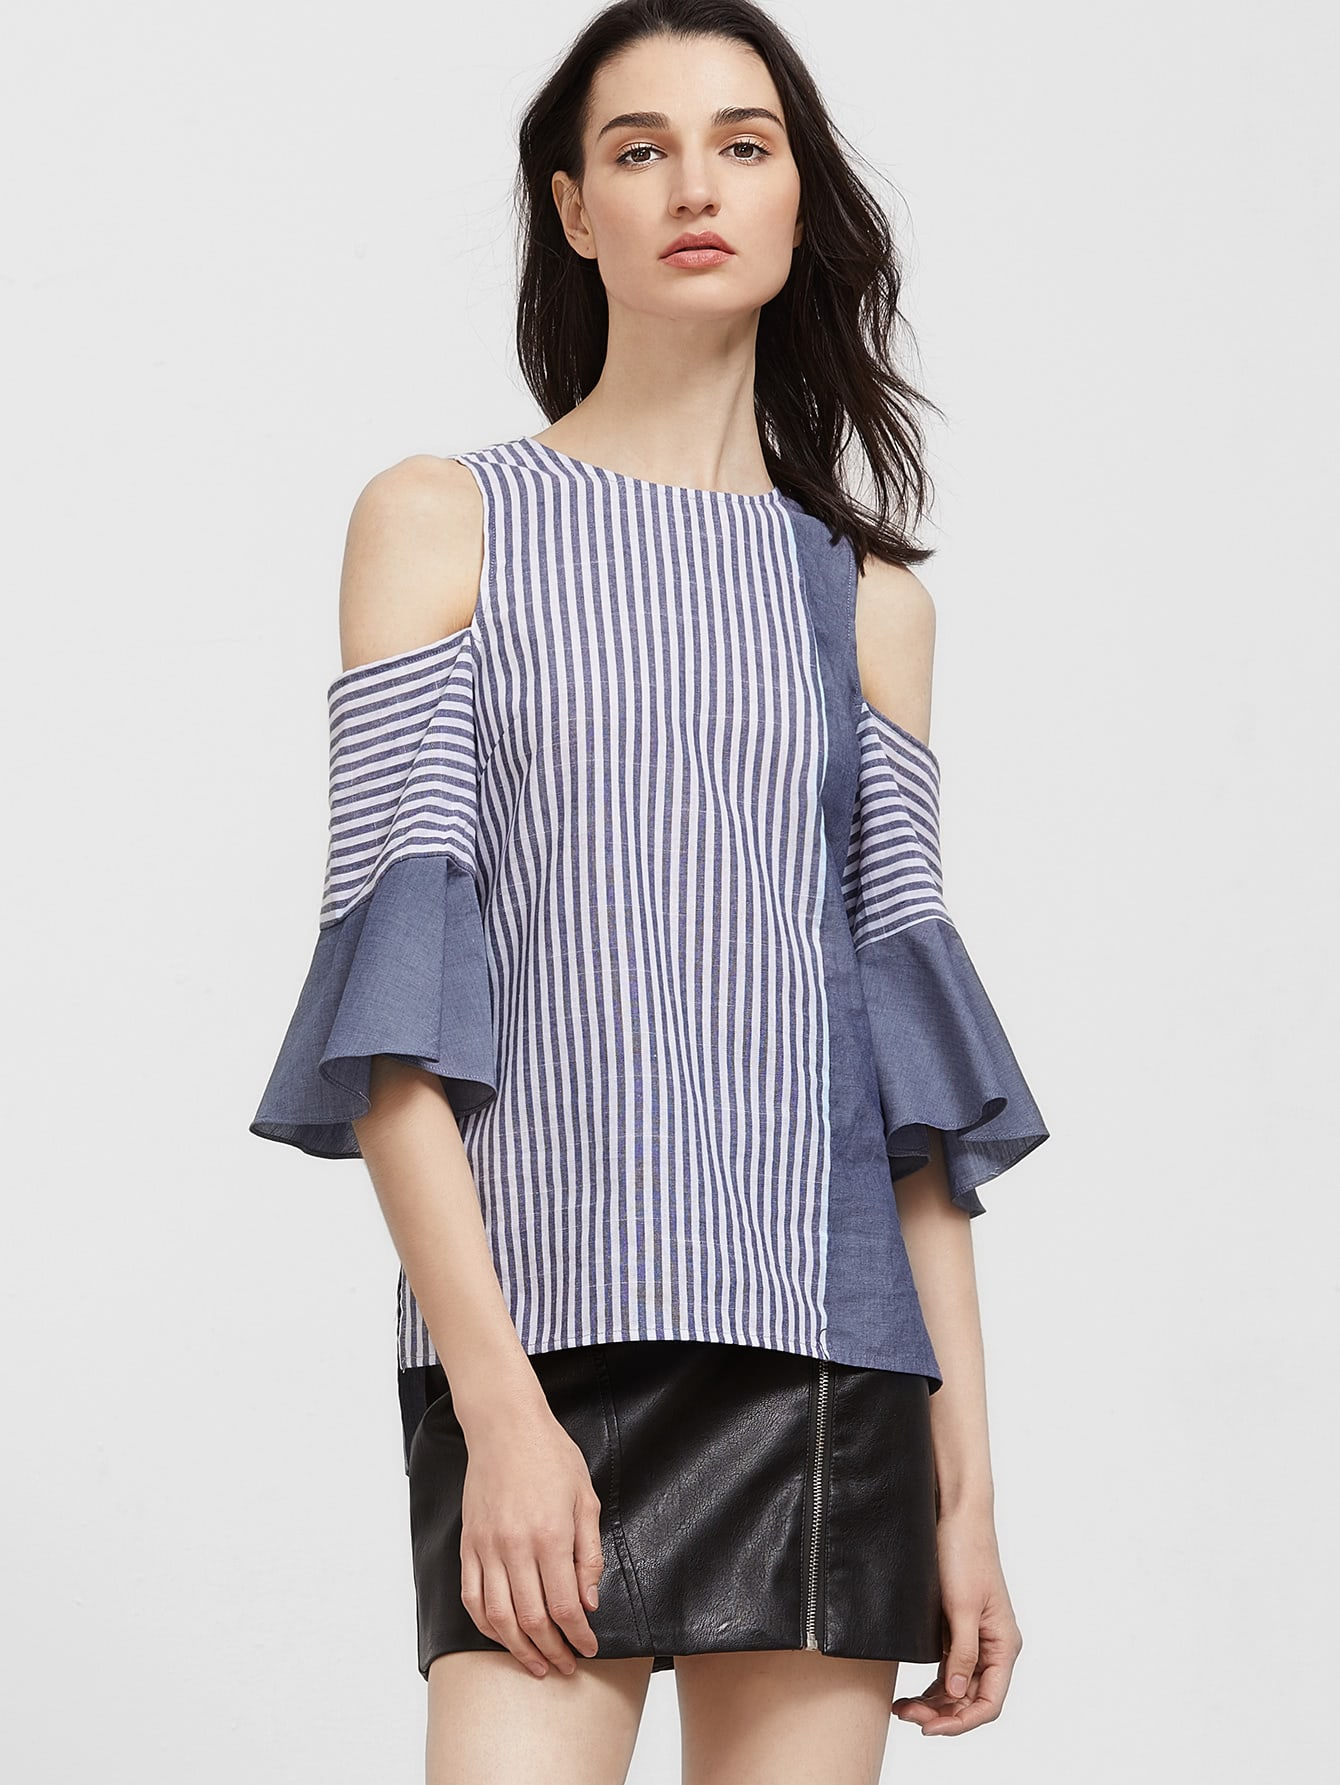 blouse161212702_2